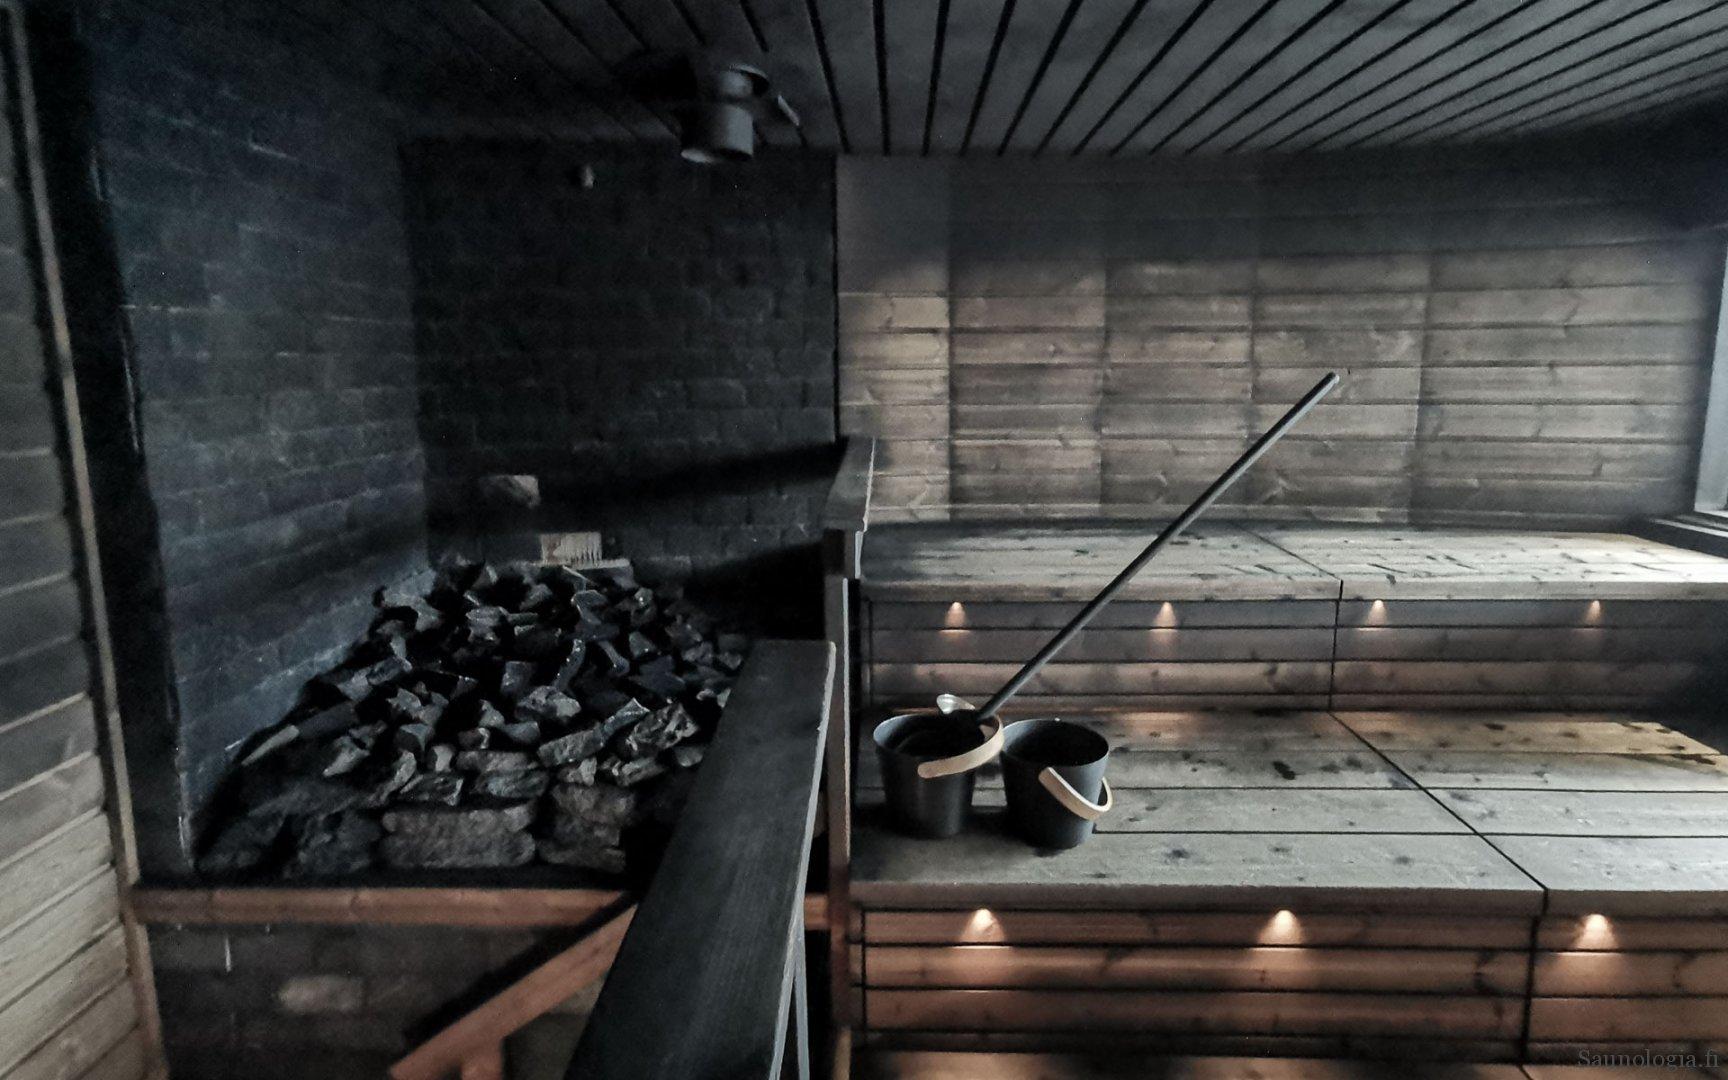 191006-kuuma-saunaravintola-savusauna-180128